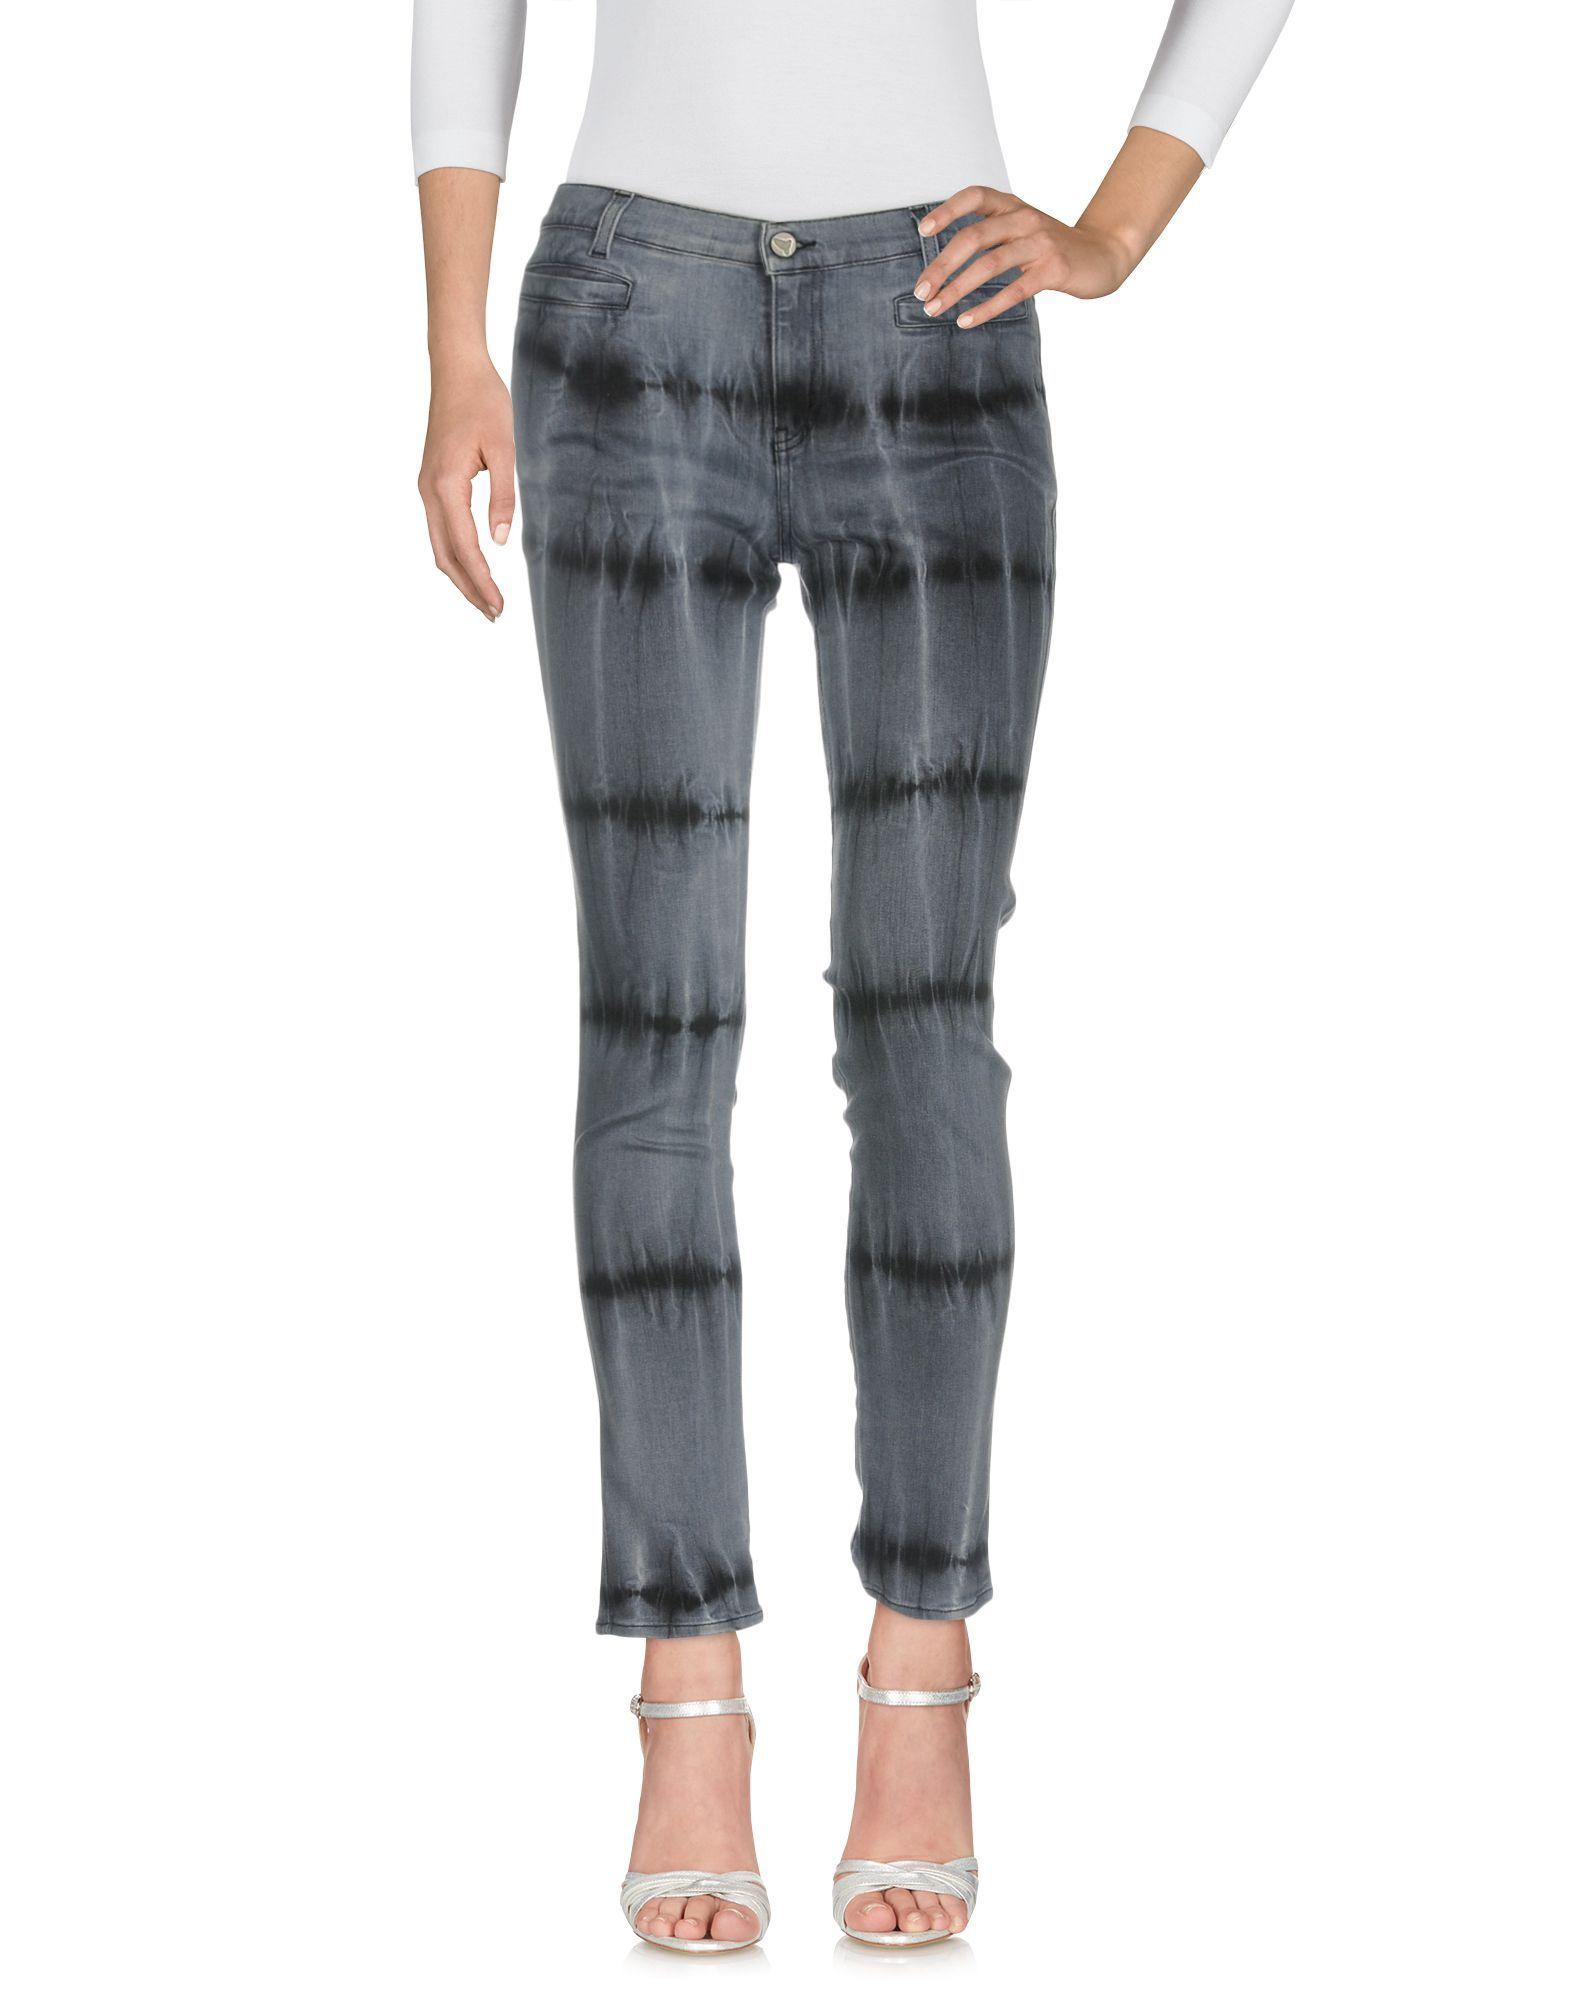 M.I.H Jeans Grey, Slate blue Cotton Pantaloni jeans